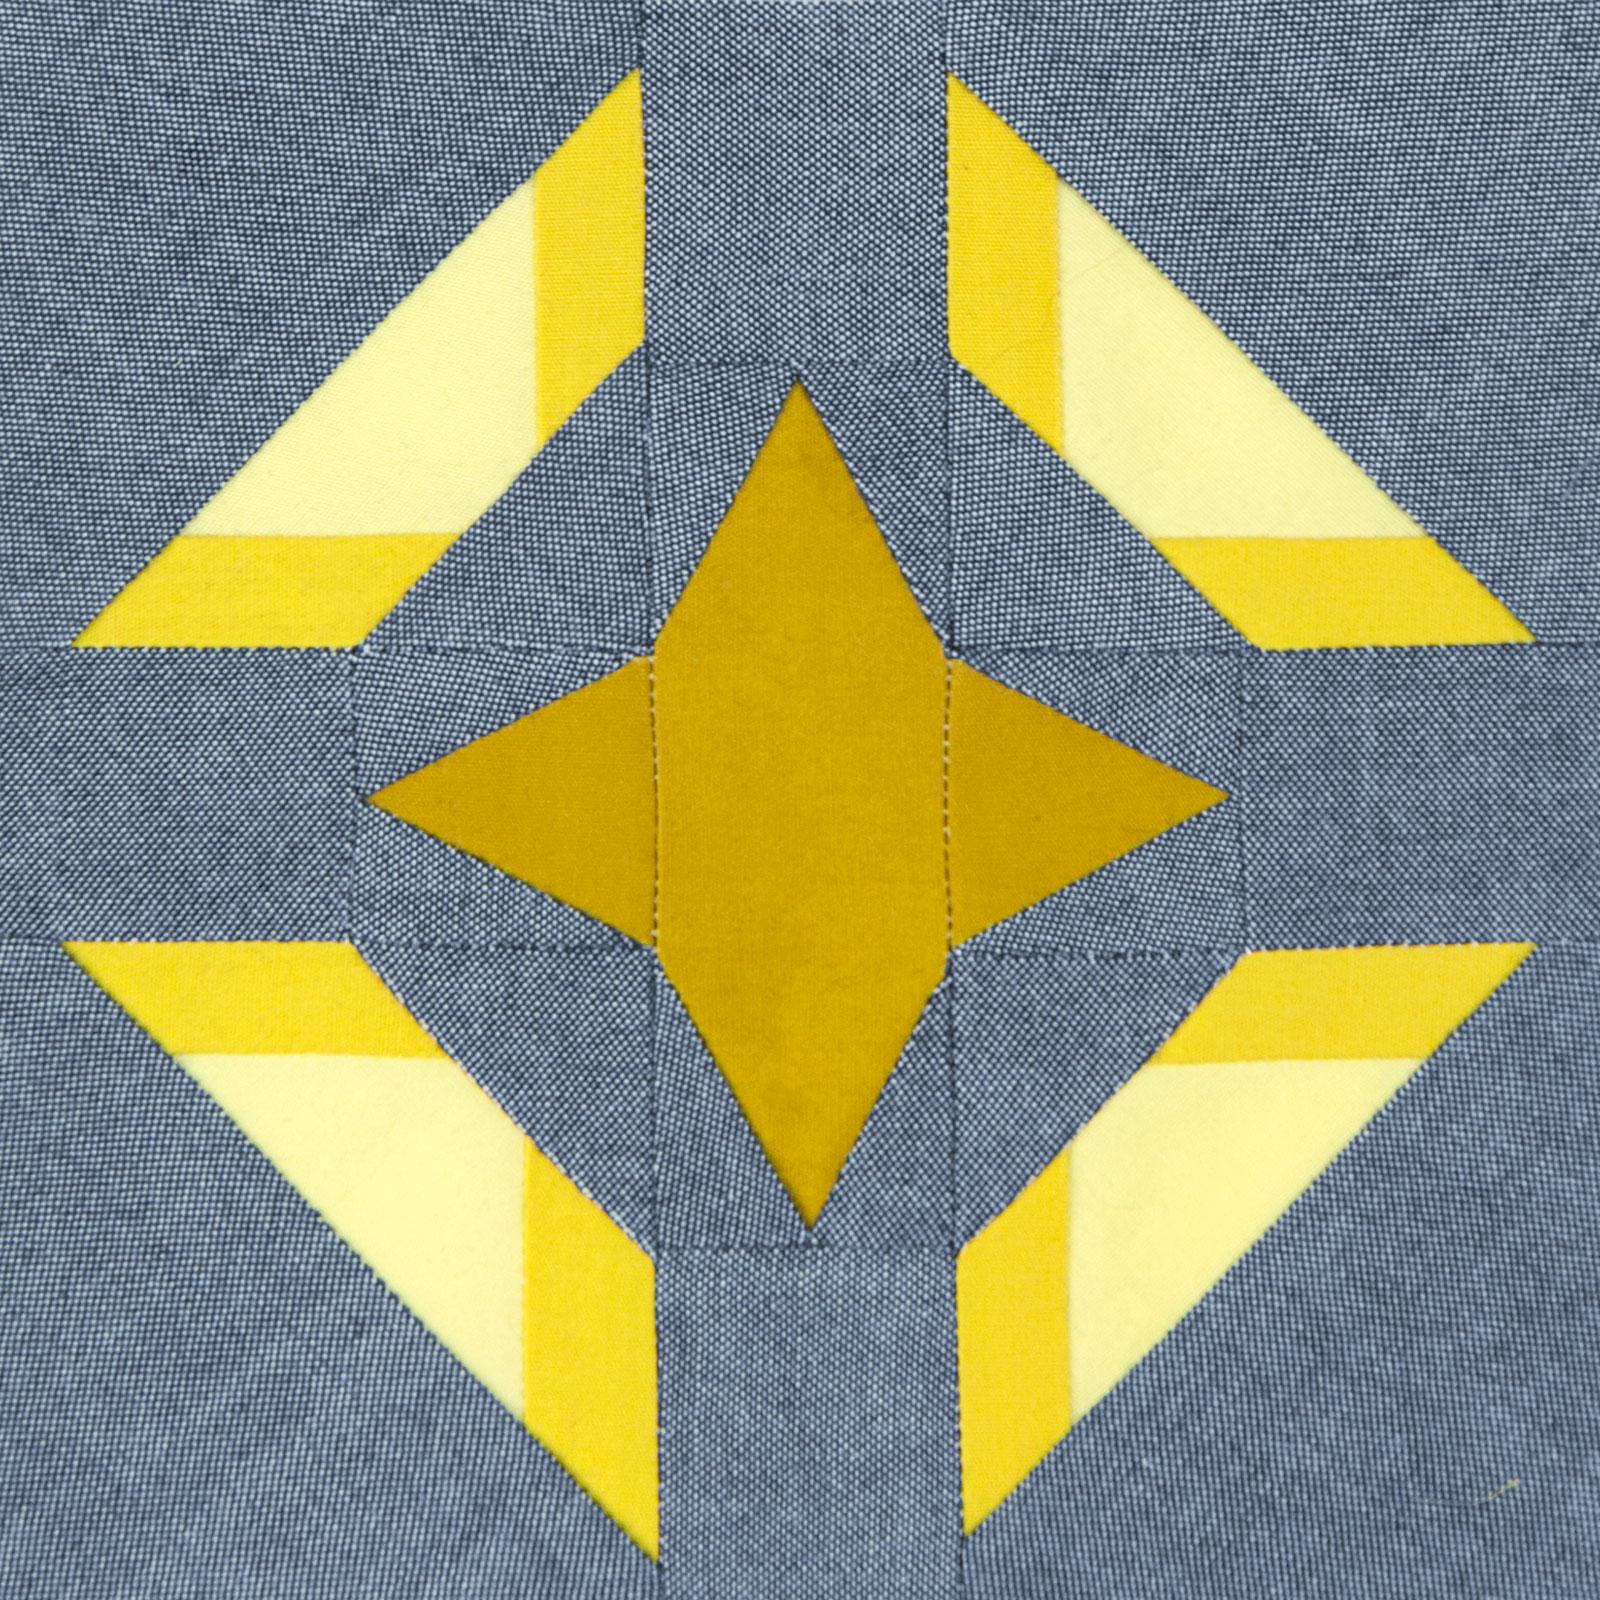 Lodestars quilt block #14: Elvia